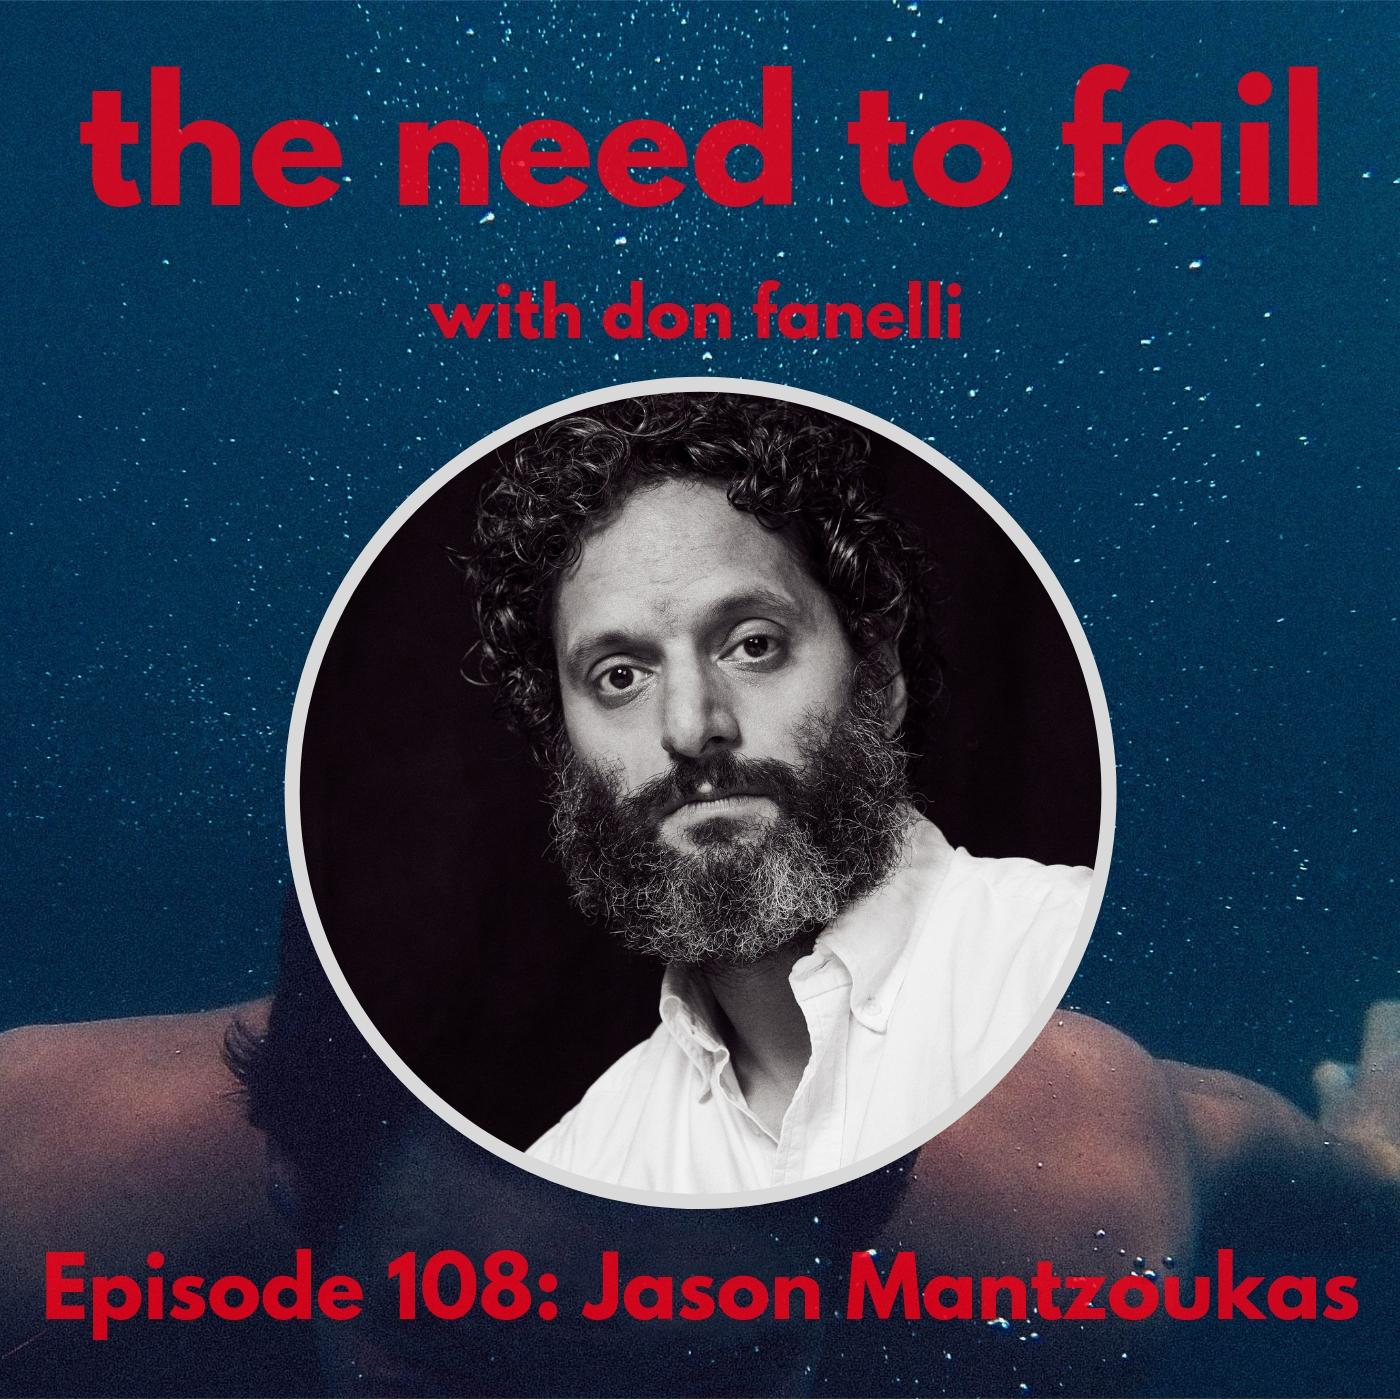 Episode 108: Jason Mantzoukas